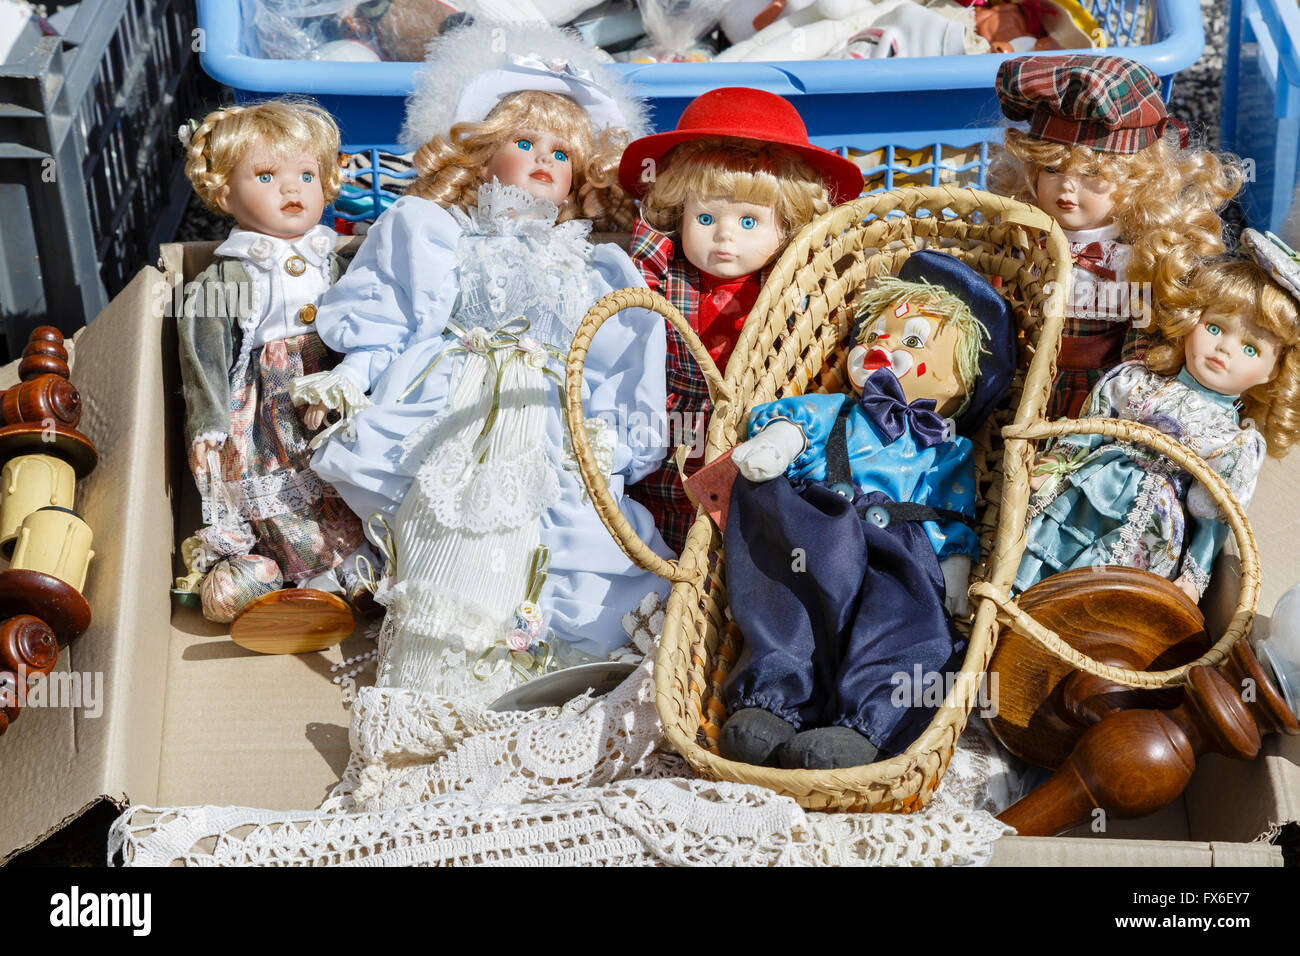 Dolls on sale at a vide-grenier, Allègre, Haute-Loire, France - Stock Image